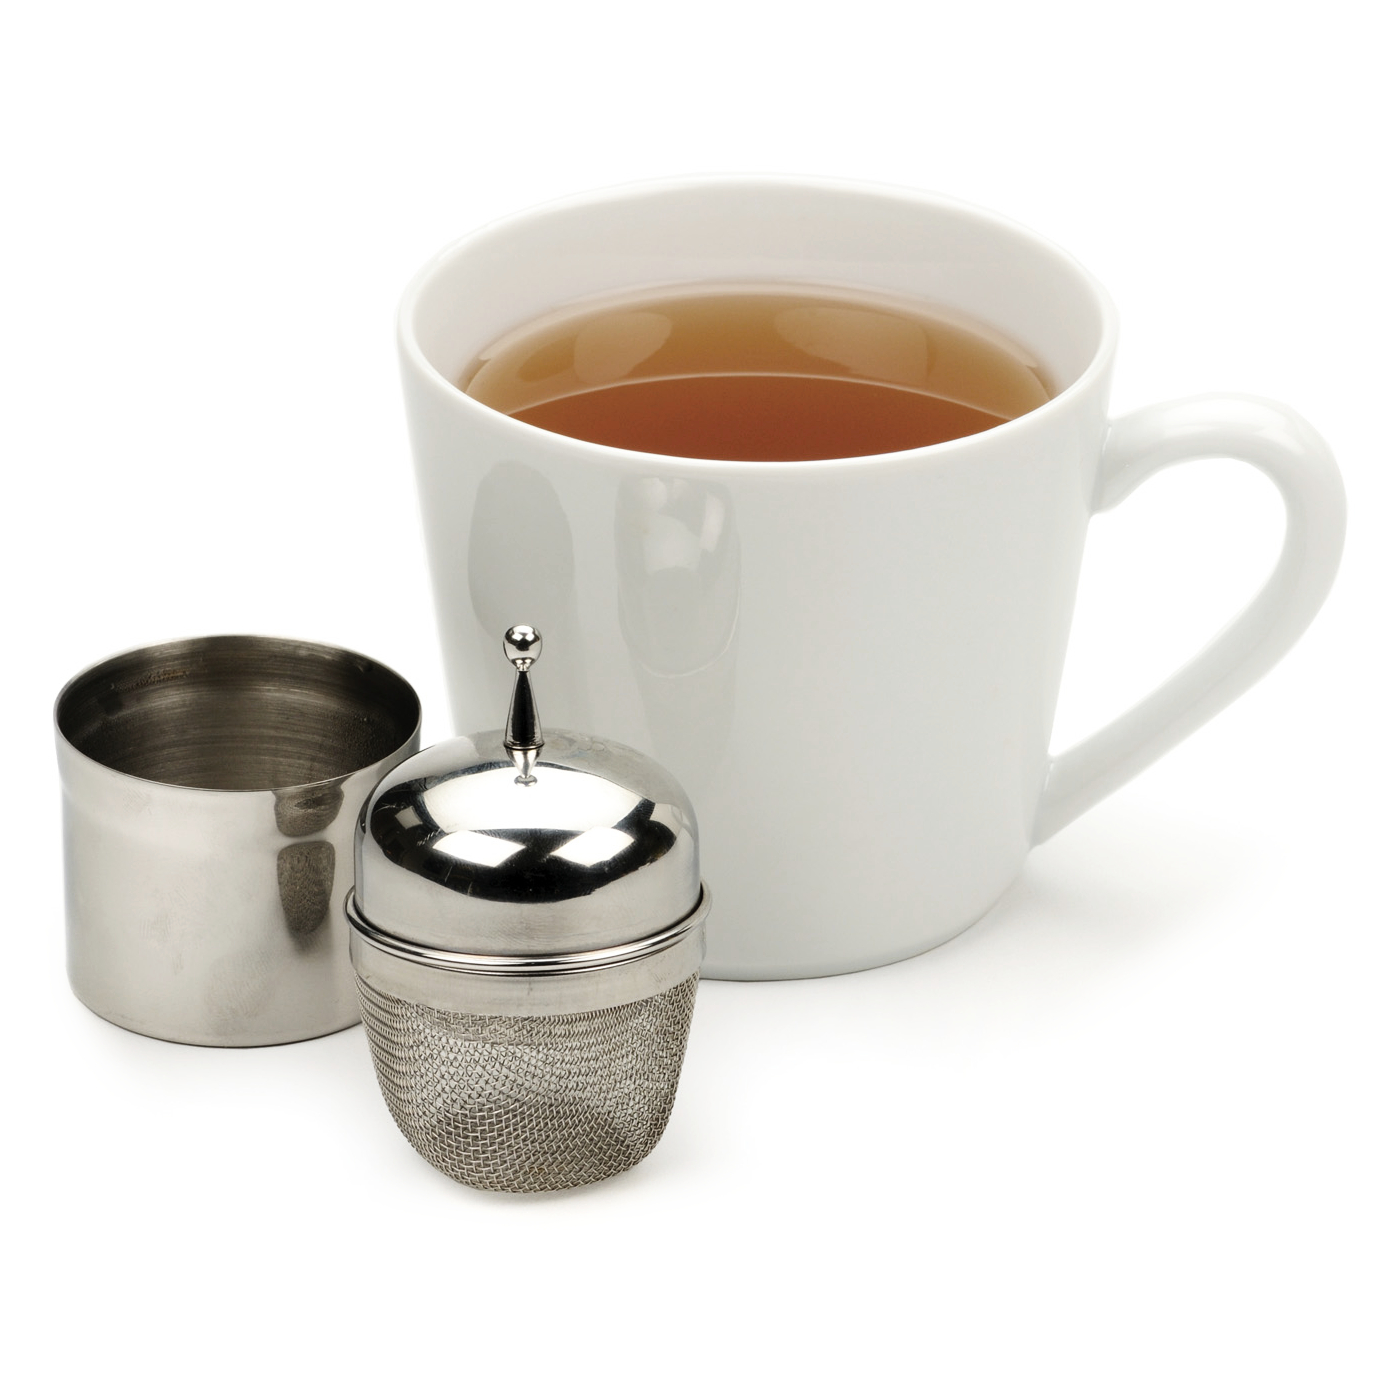 RSVP Endurance Stainless Steel Standard Size Floating Tea Infuser